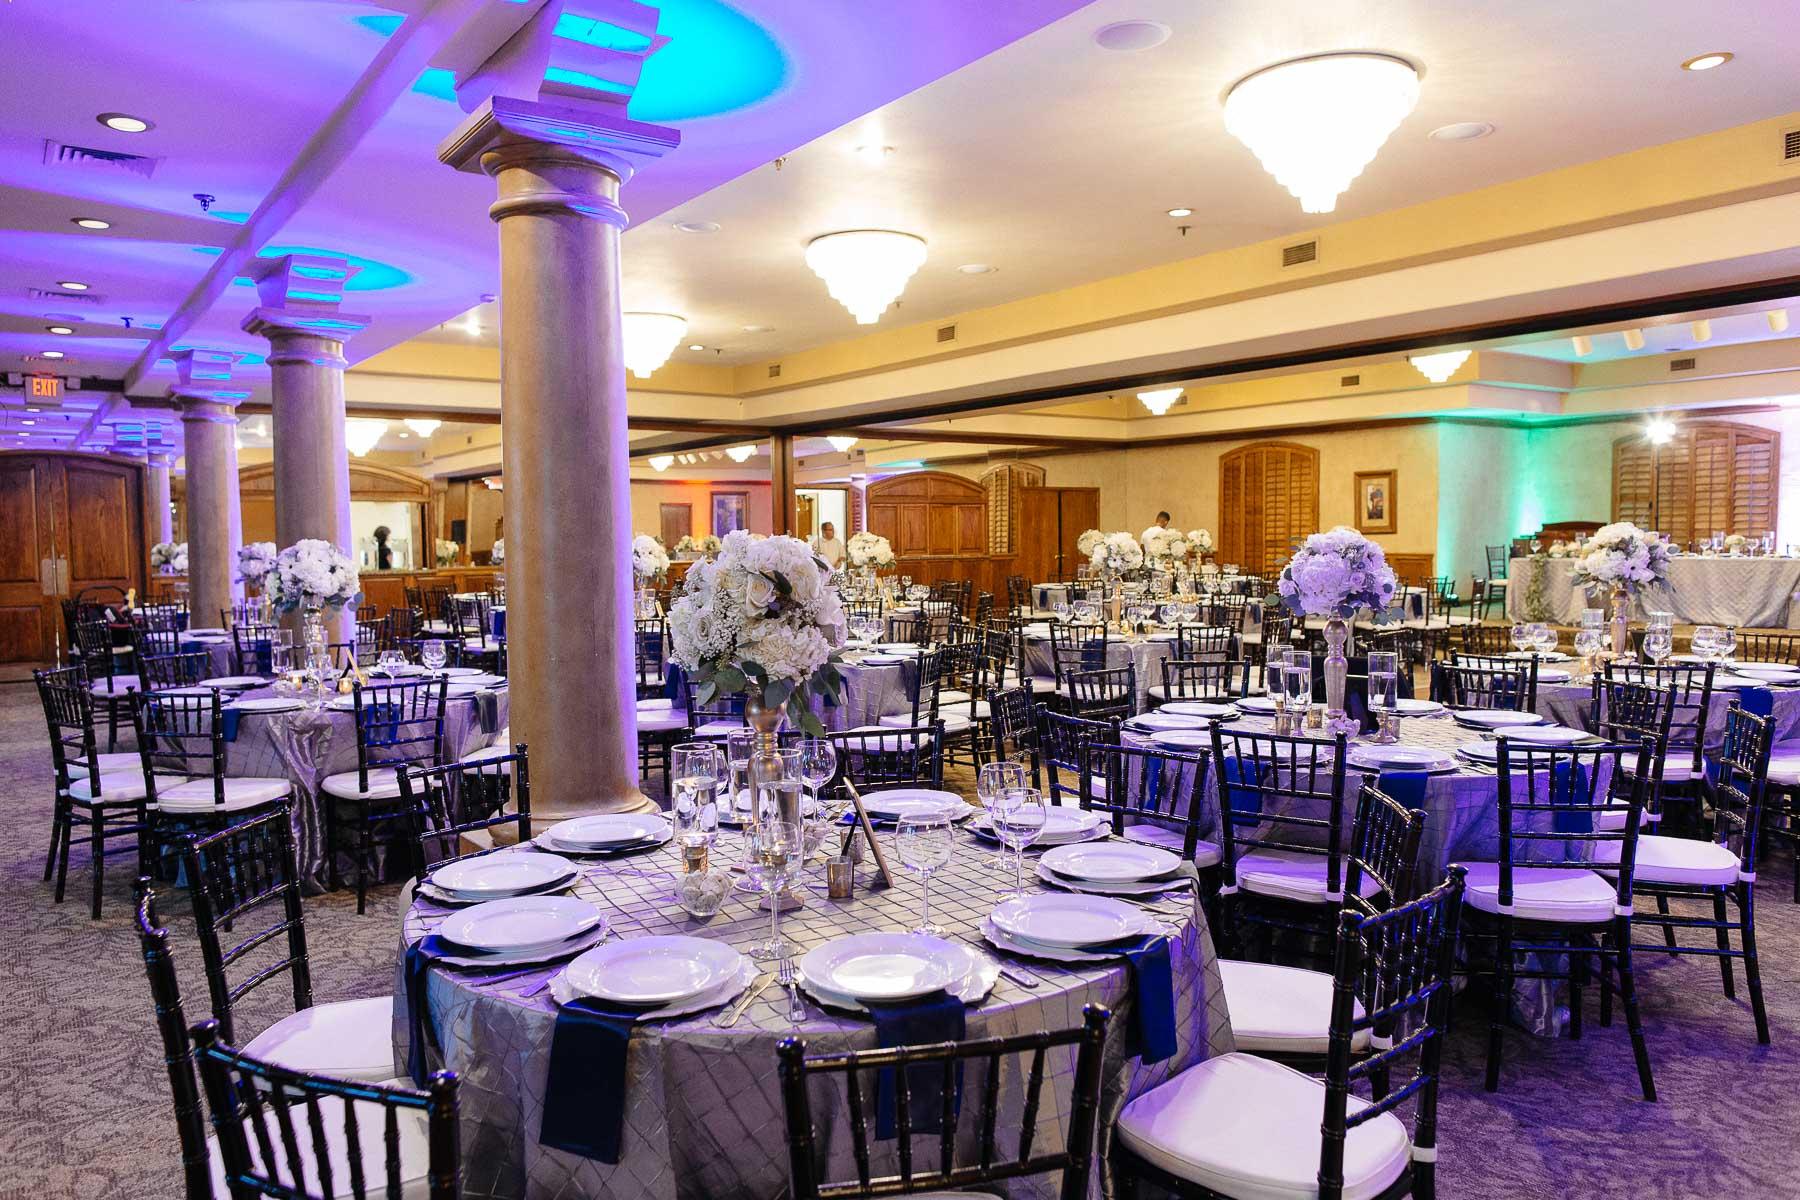 161029-Luxium-Weddings-Arizona-Jeff-Griselda-First-Look-Val-Vista-Lakes-Gilber-073.jpg